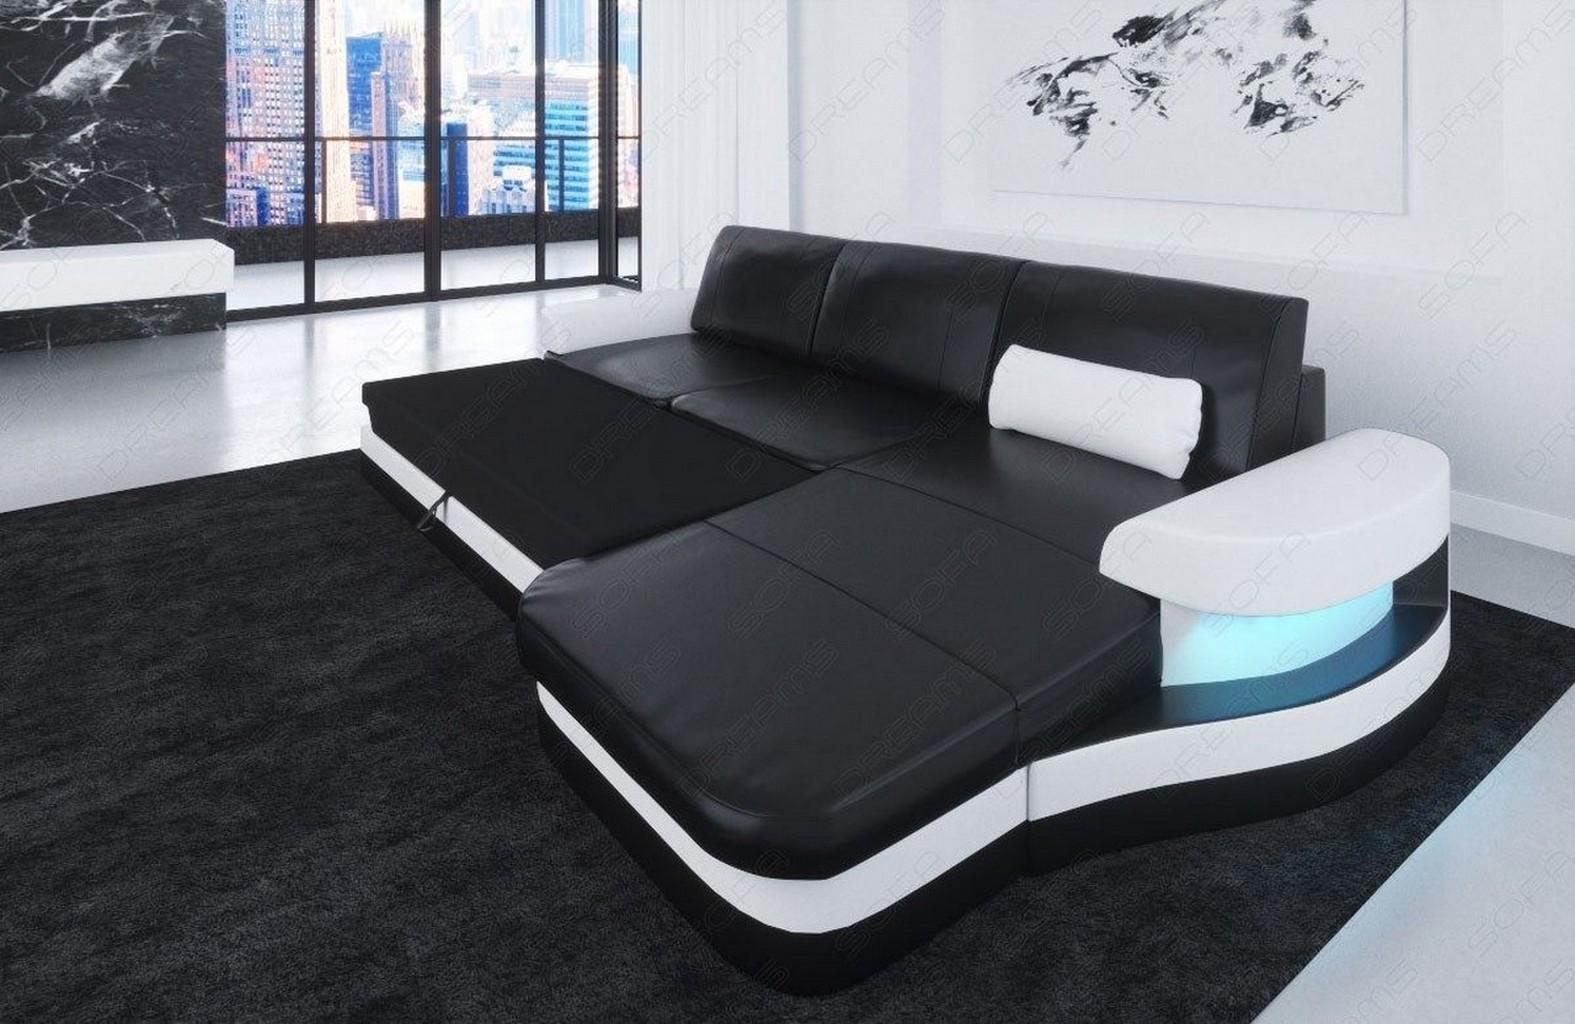 leather corner sofa couch modena l shaped design optional. Black Bedroom Furniture Sets. Home Design Ideas